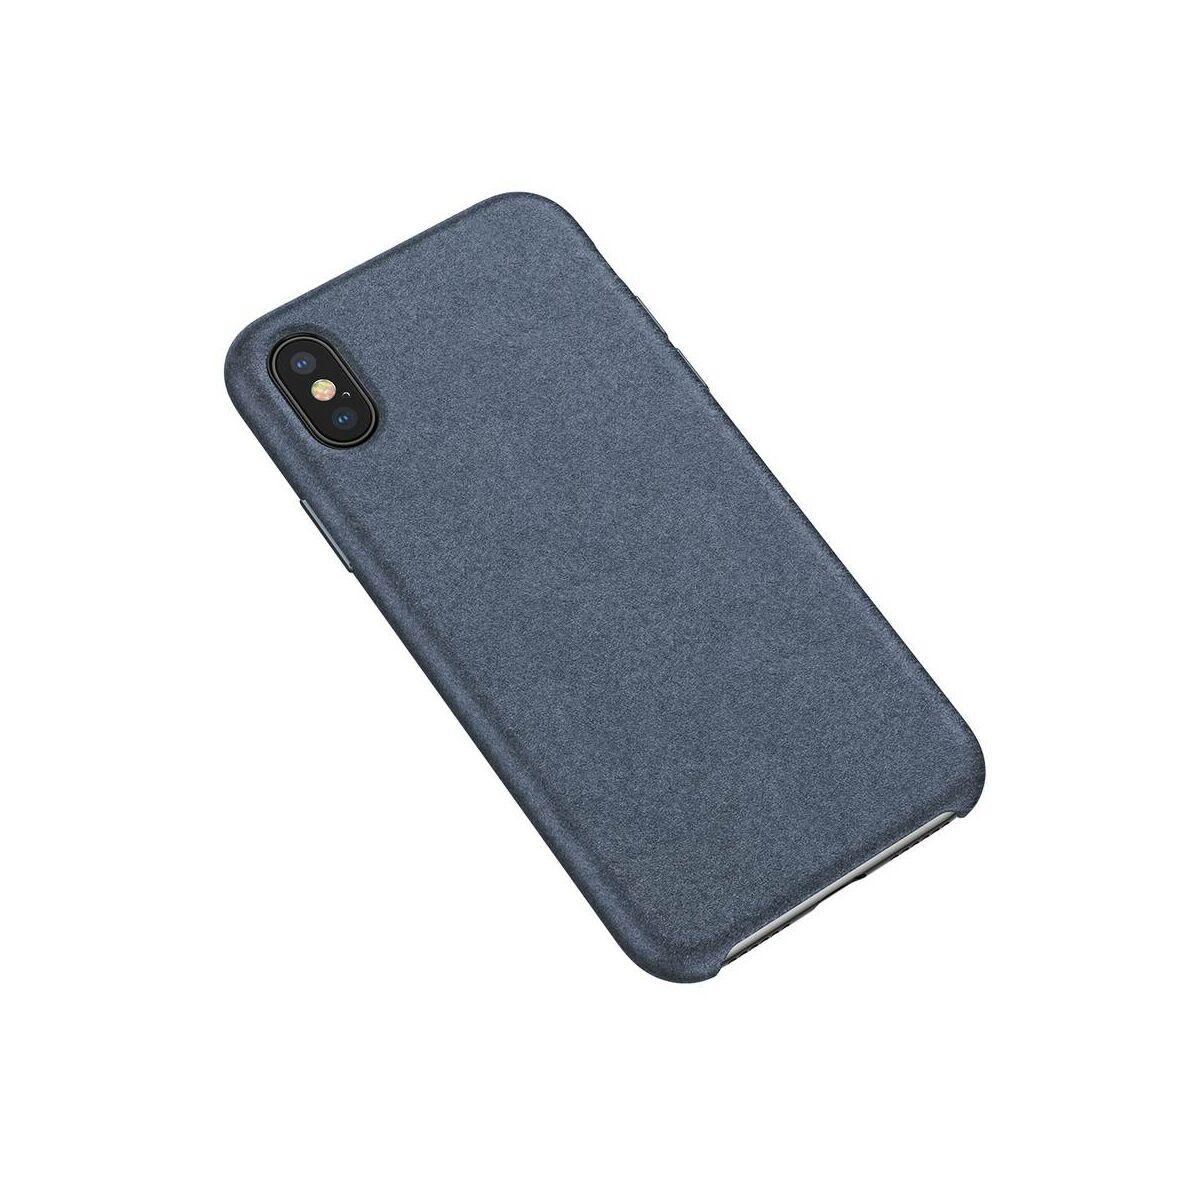 Baseus iPhone XS Max tok, Original Super Fiber, csúszásmentes, kék (WIAPIPH65-YP03)